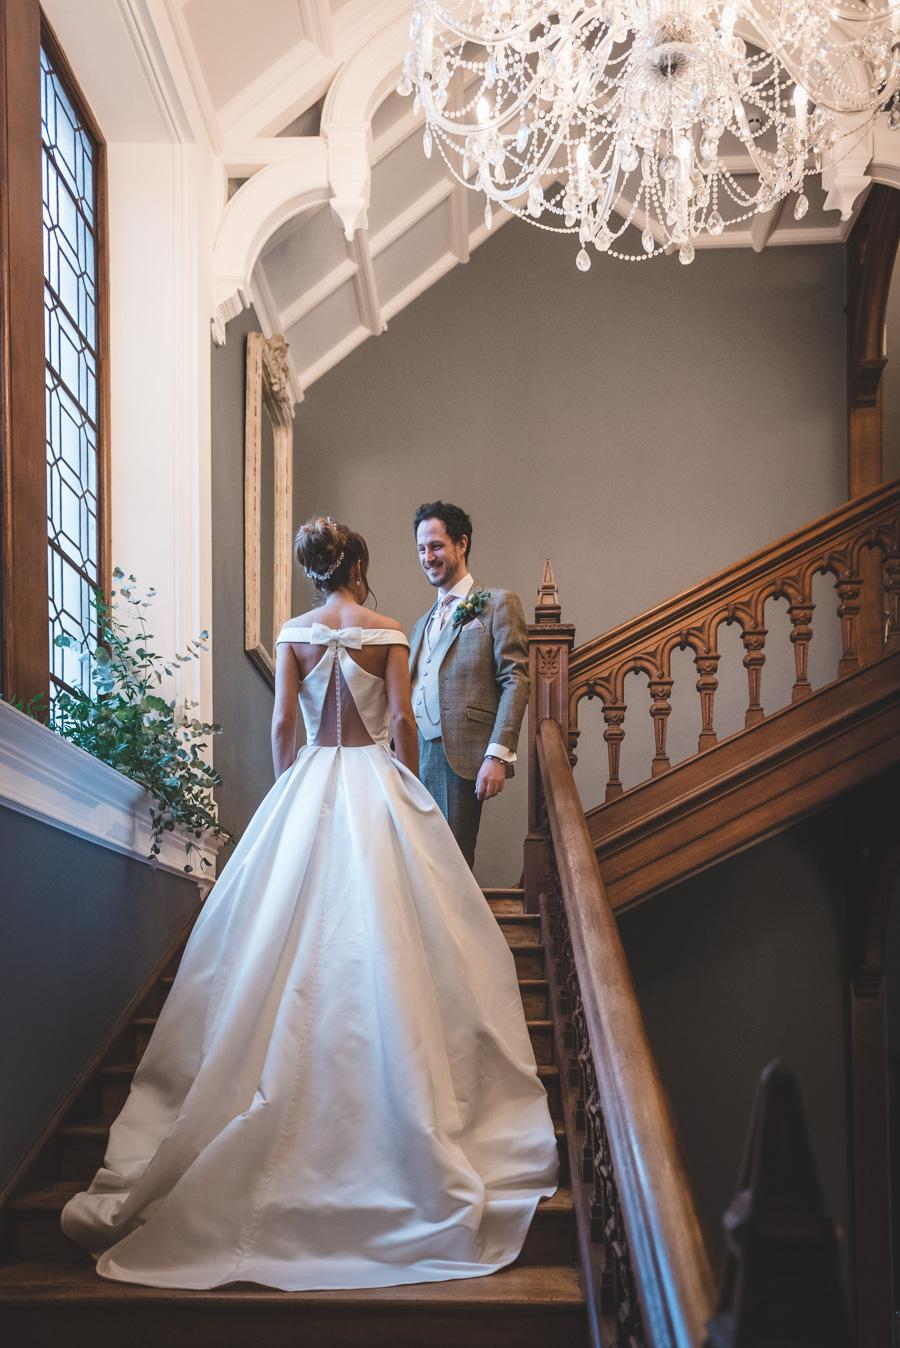 Yorkshire wedding venue styling ideas, photo credit Boho Chic Weddings (22)